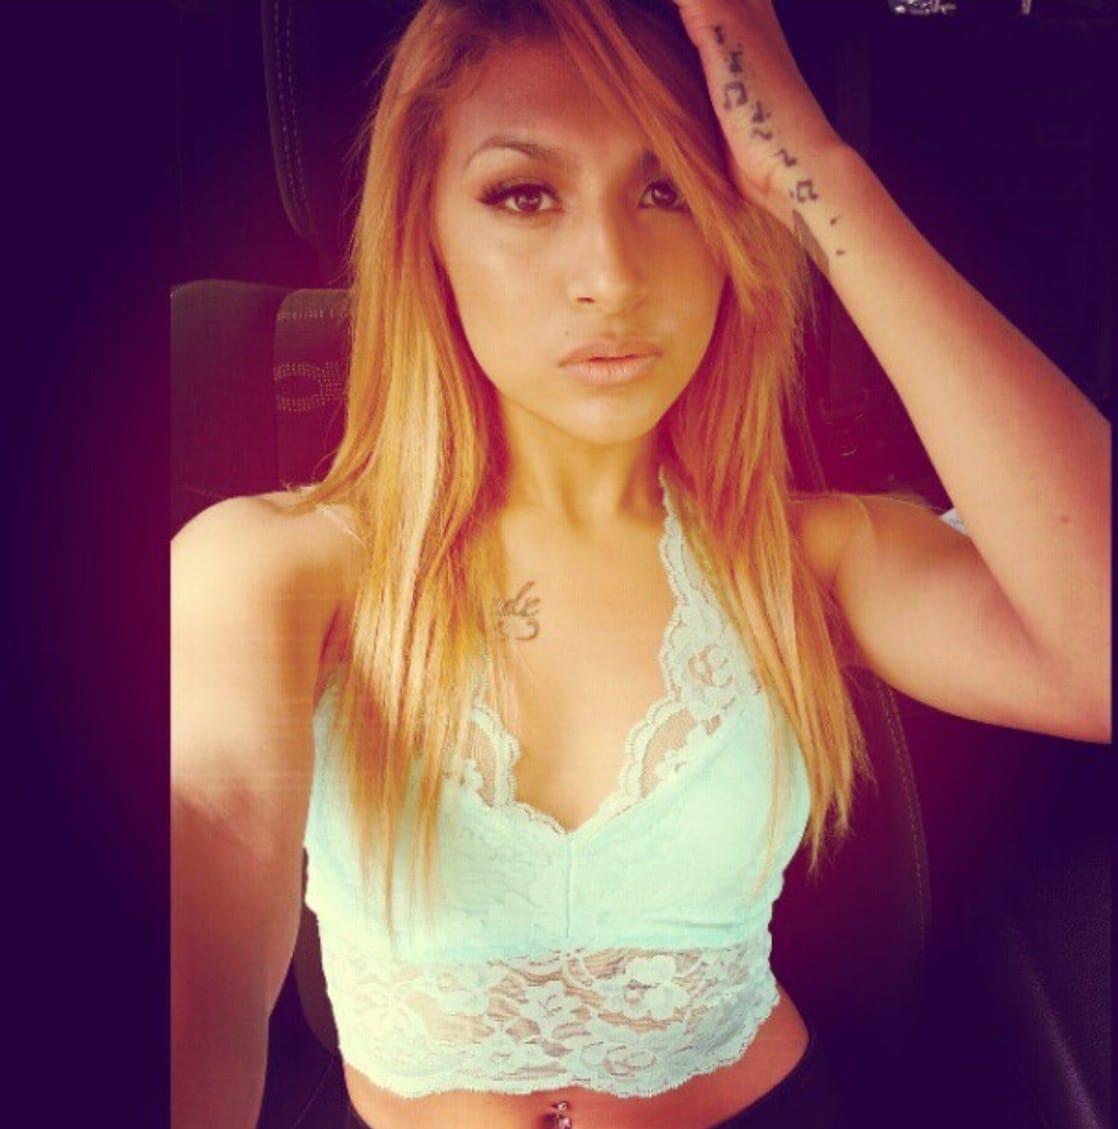 Sara Pavan nudes (84 pictures) Hot, Snapchat, in bikini